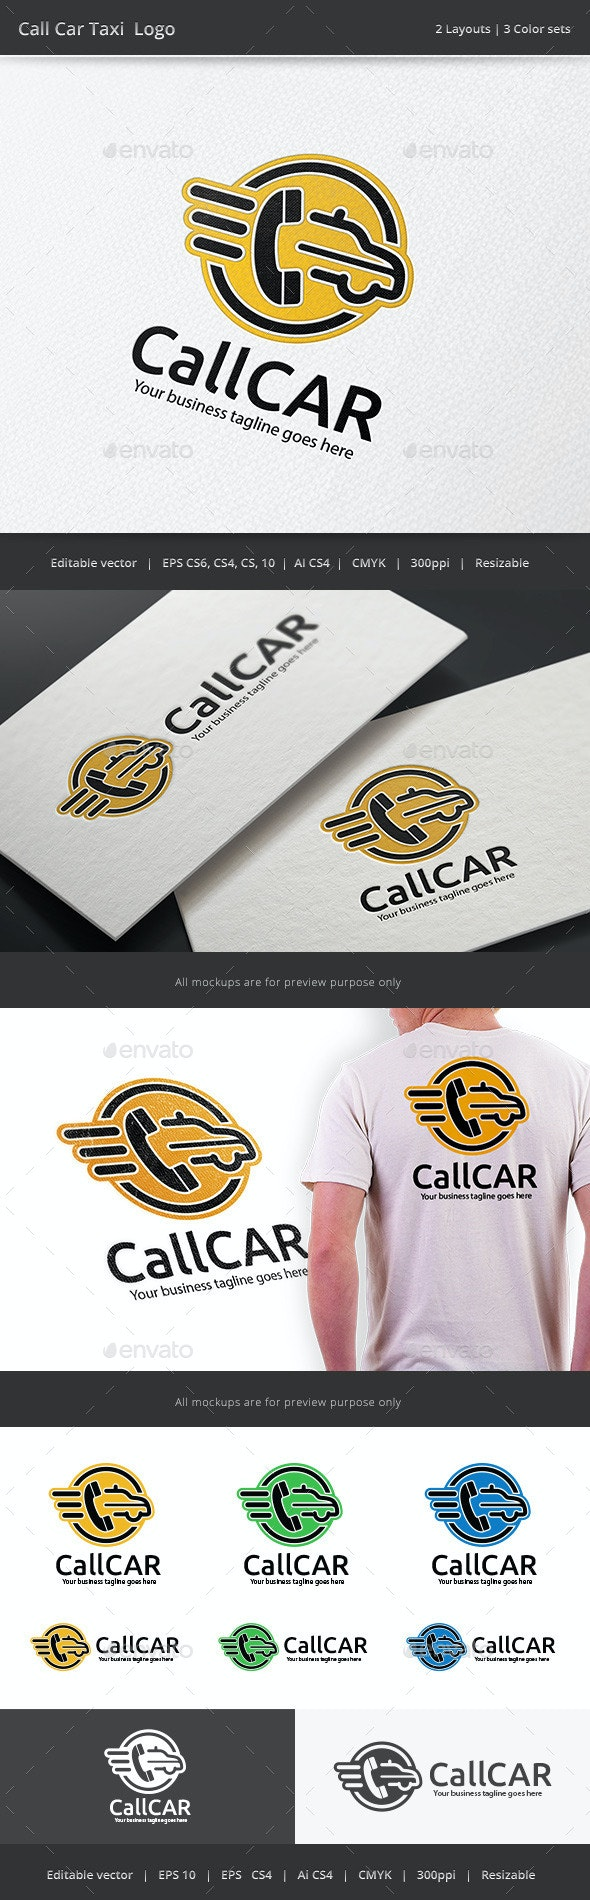 Call Taxi Car Logo - Objects Logo Templates